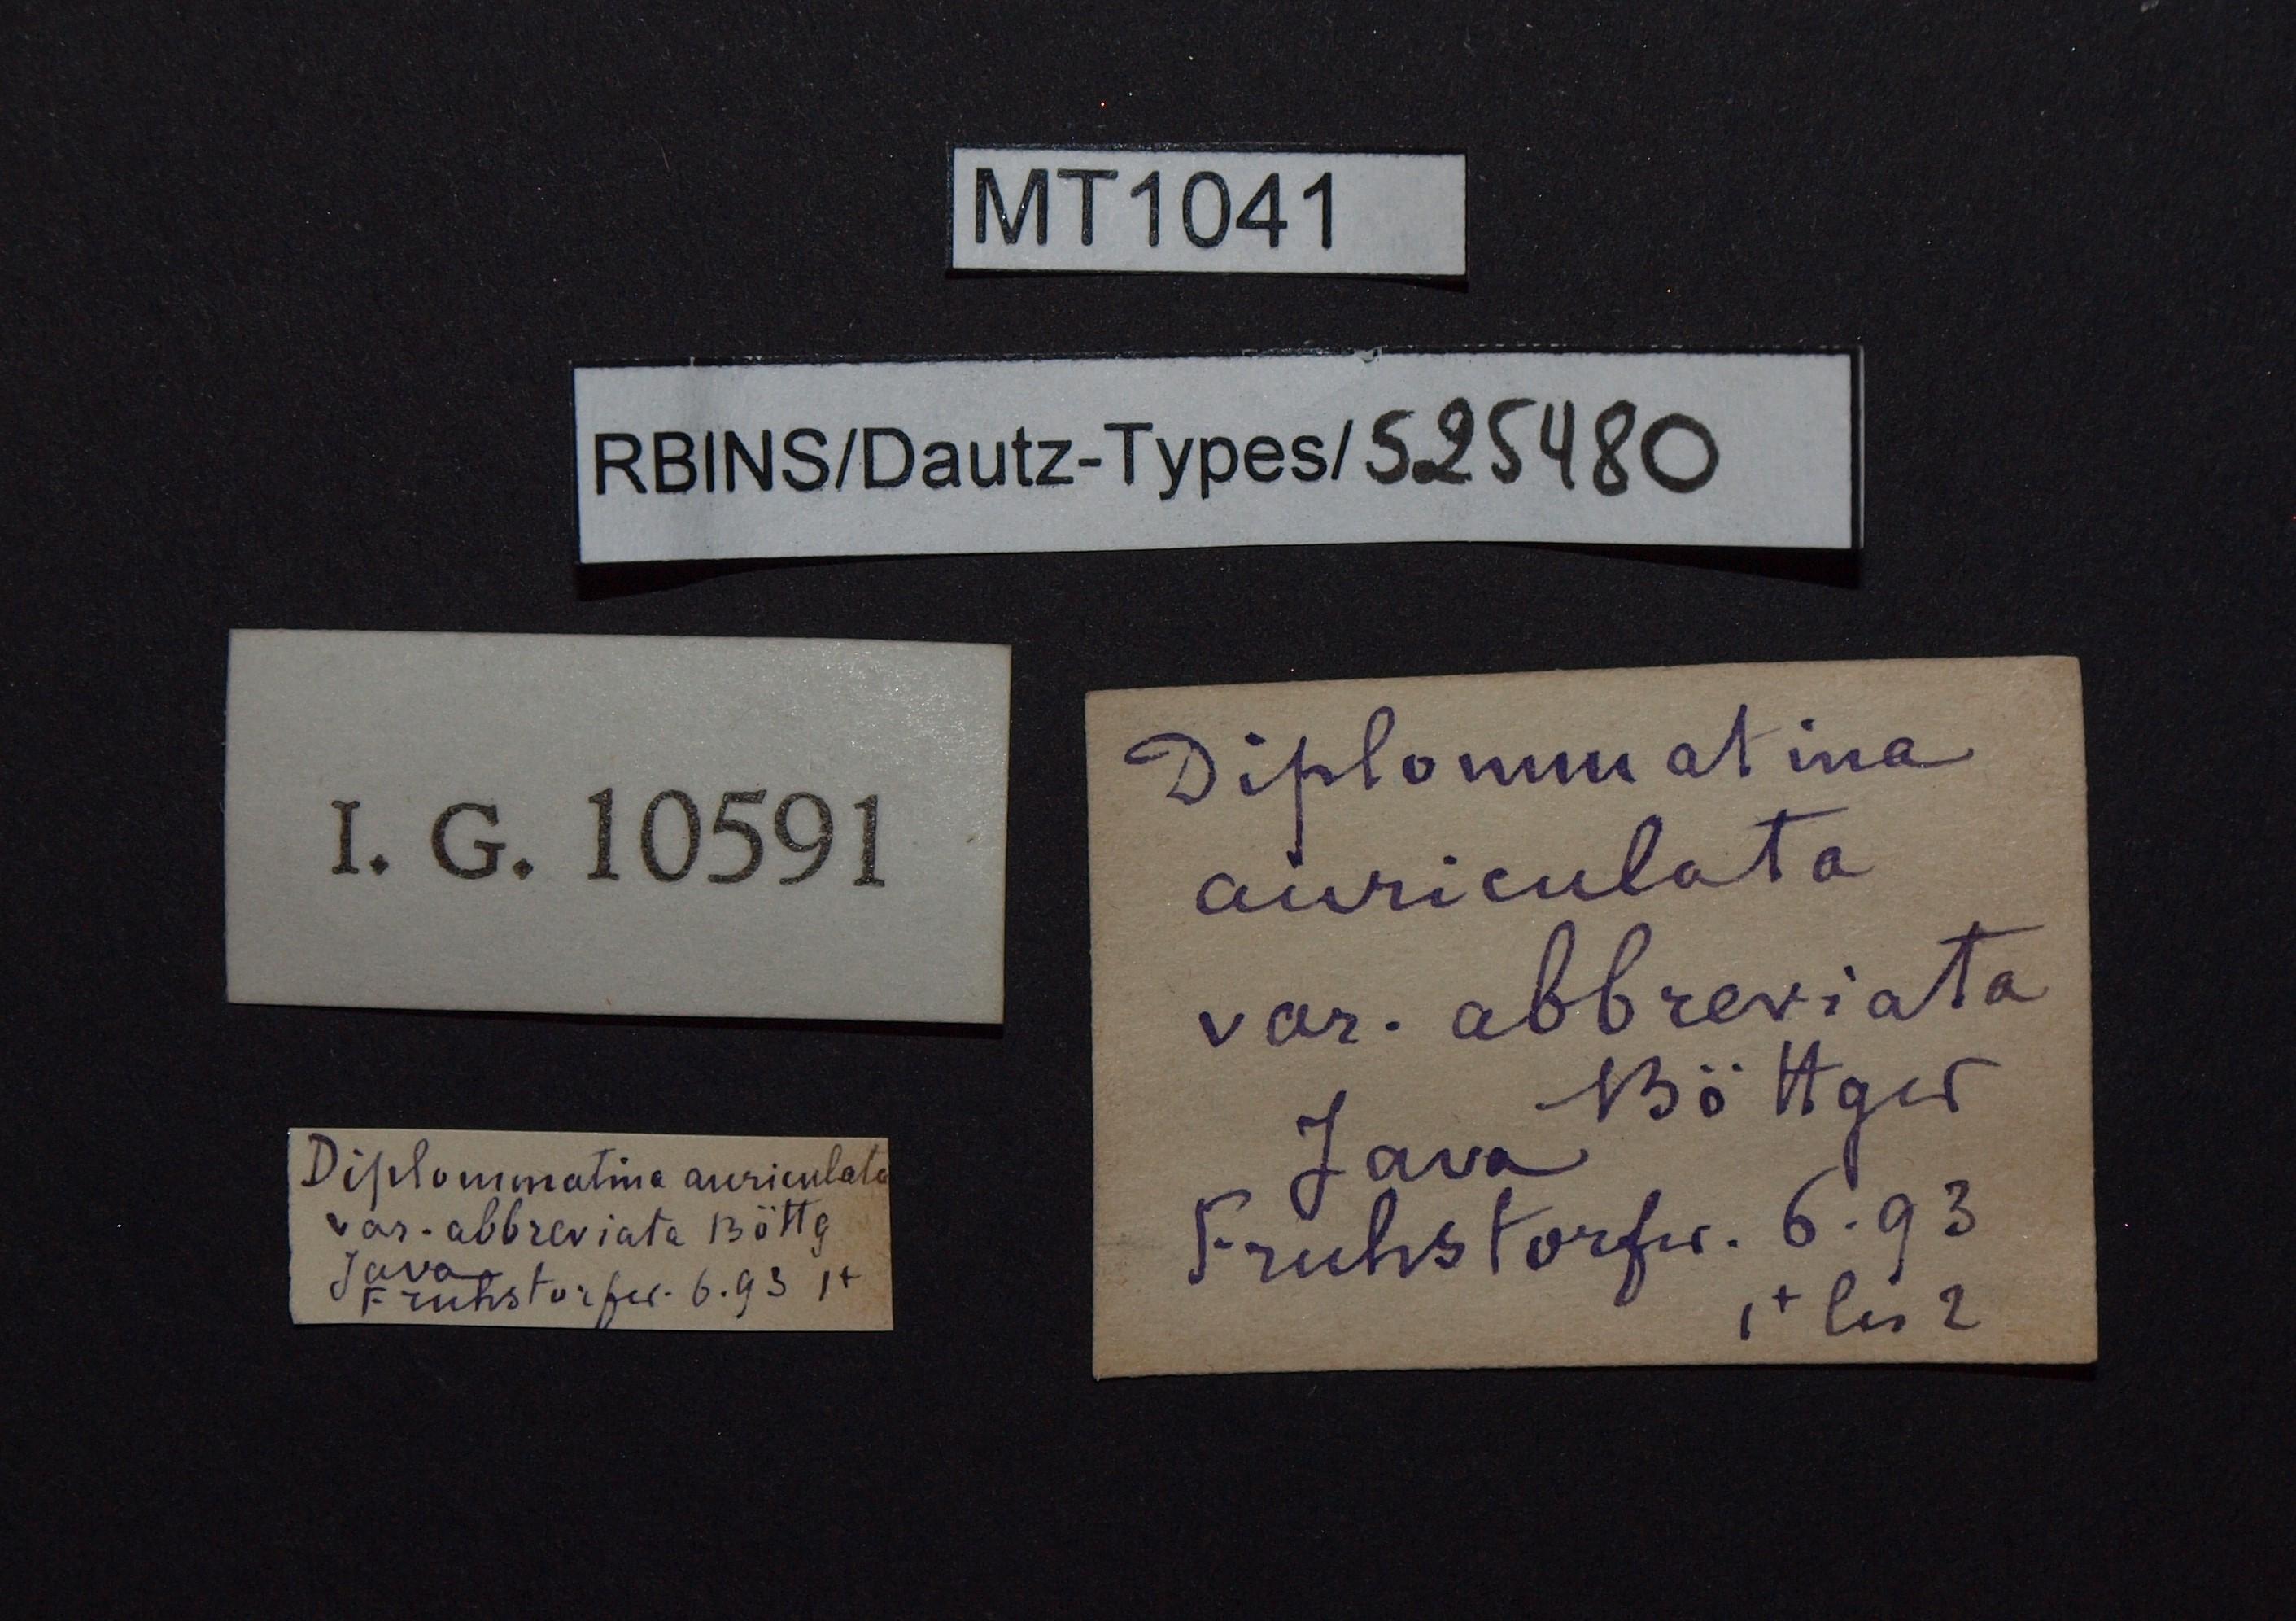 BE-RBINS-INV PARATYPE MT 1041 Diplommatina (Sinica) auriculata var. abbreviata LABELS.jpg